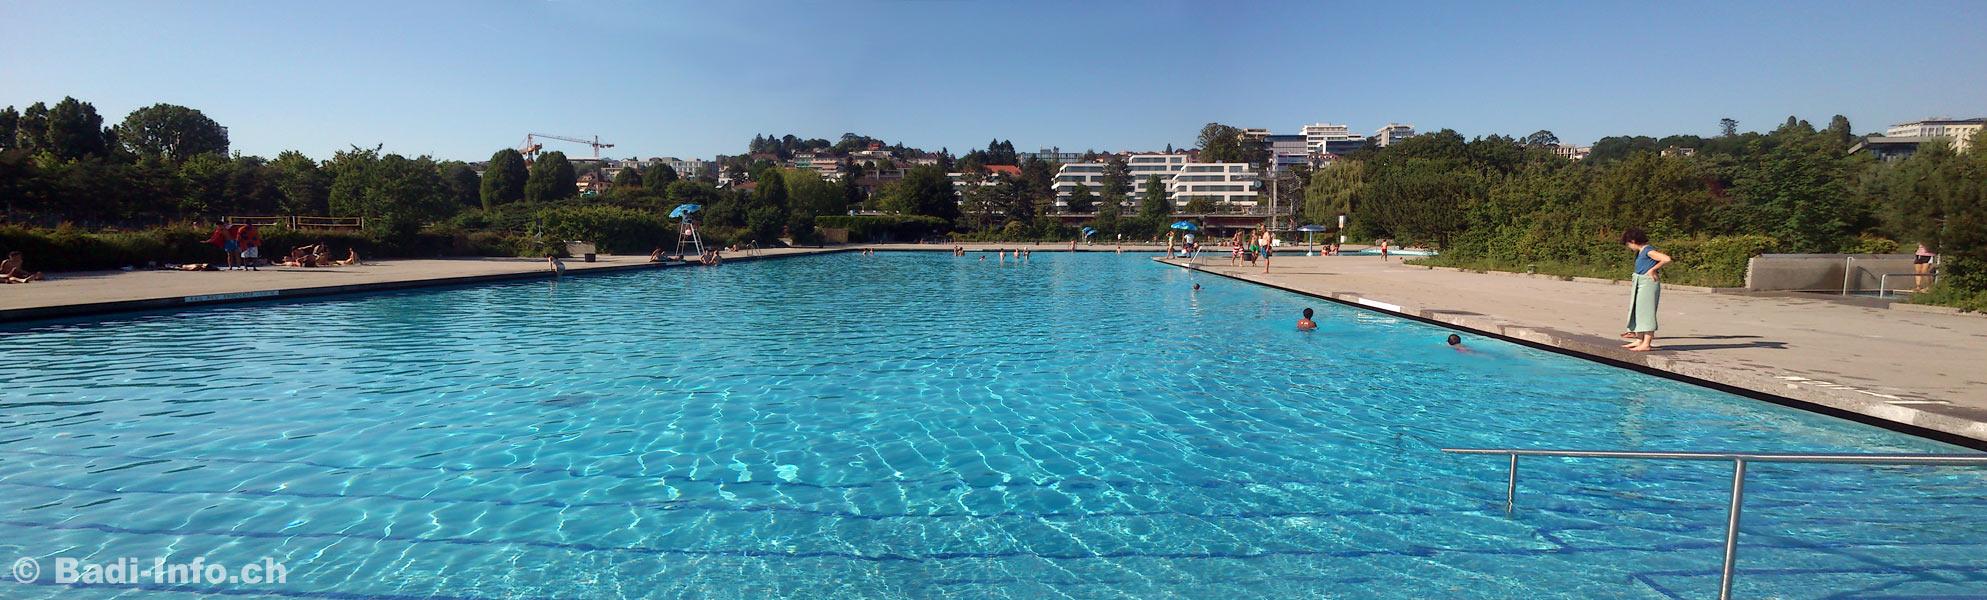 piscine bellerive plage lausanne bassin non nageurs